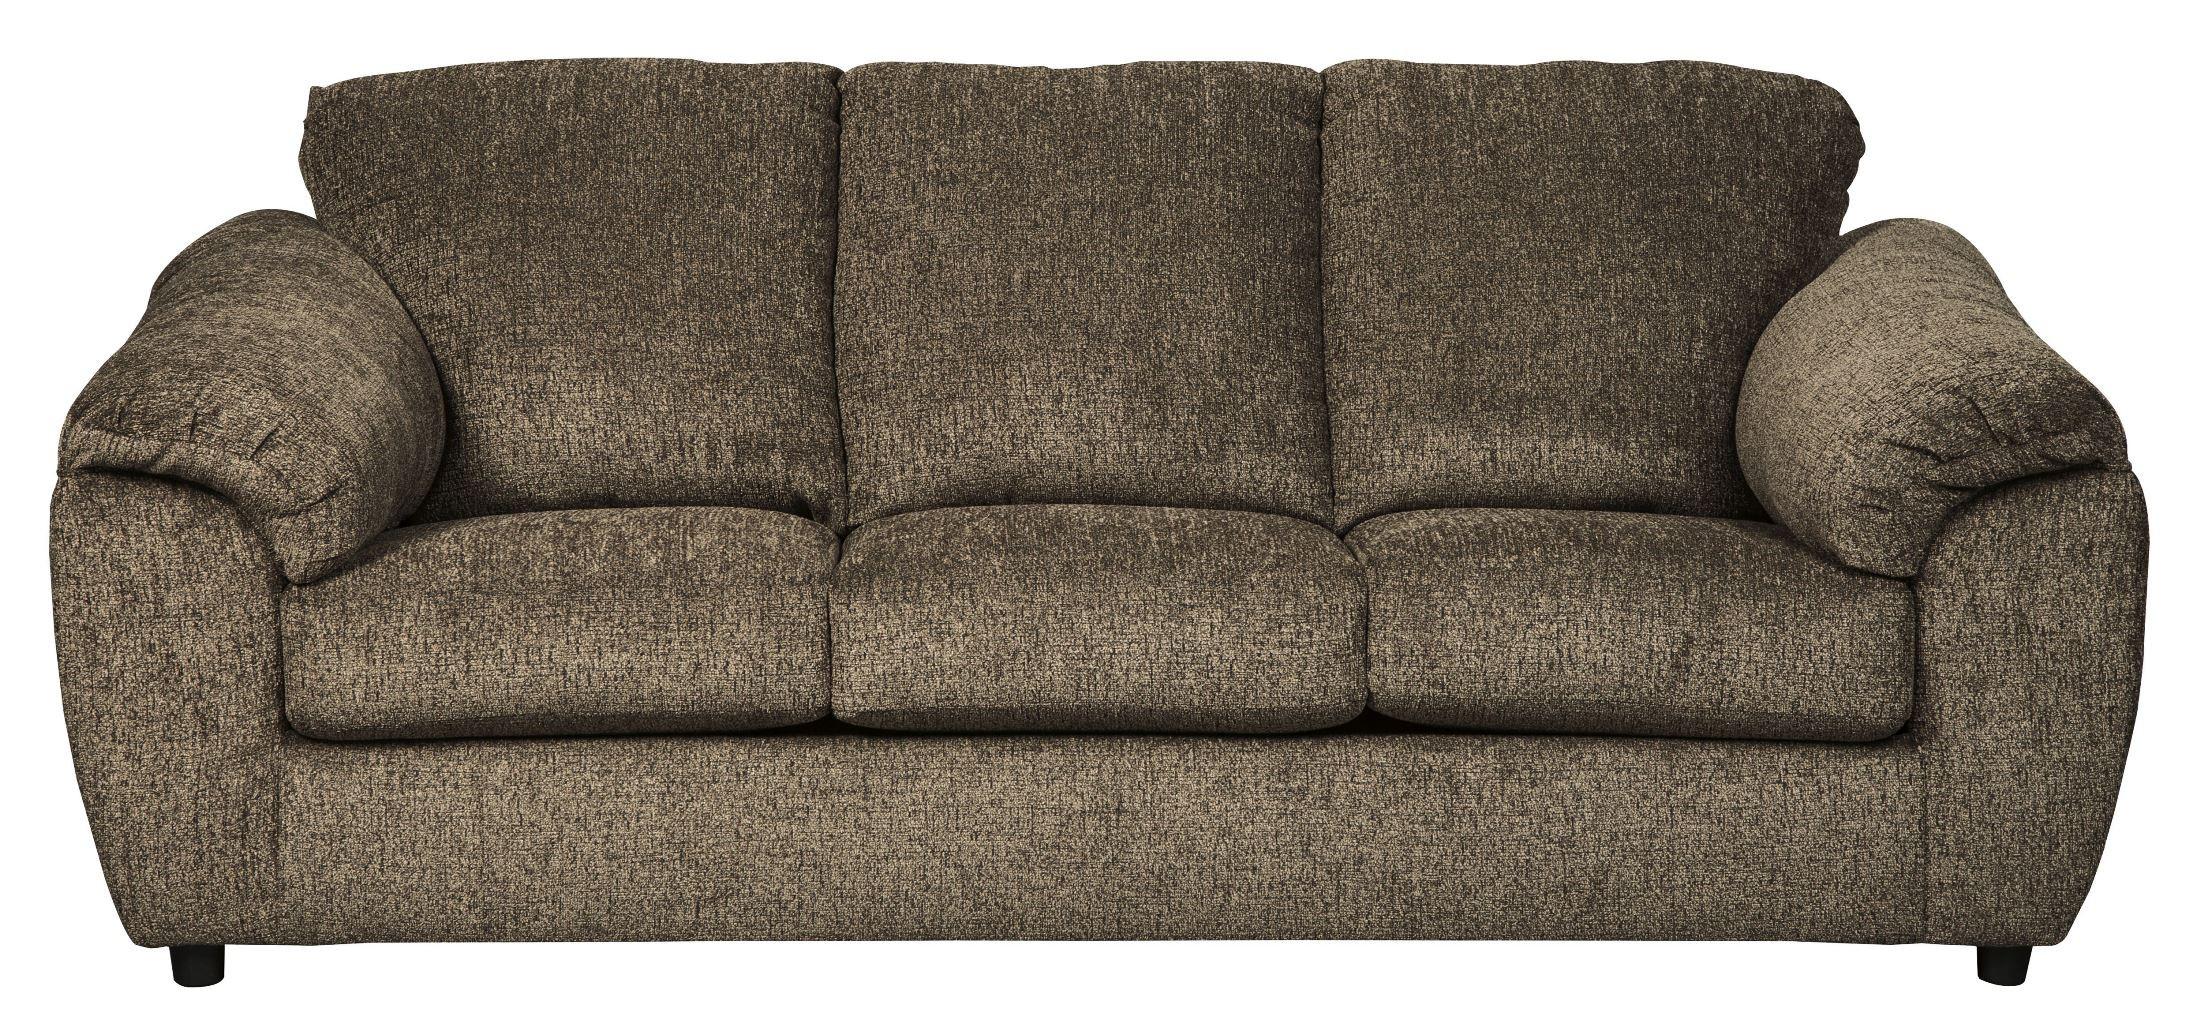 Azaline Umber Color 2 Piece Sofa And Loveseat Marjen Of